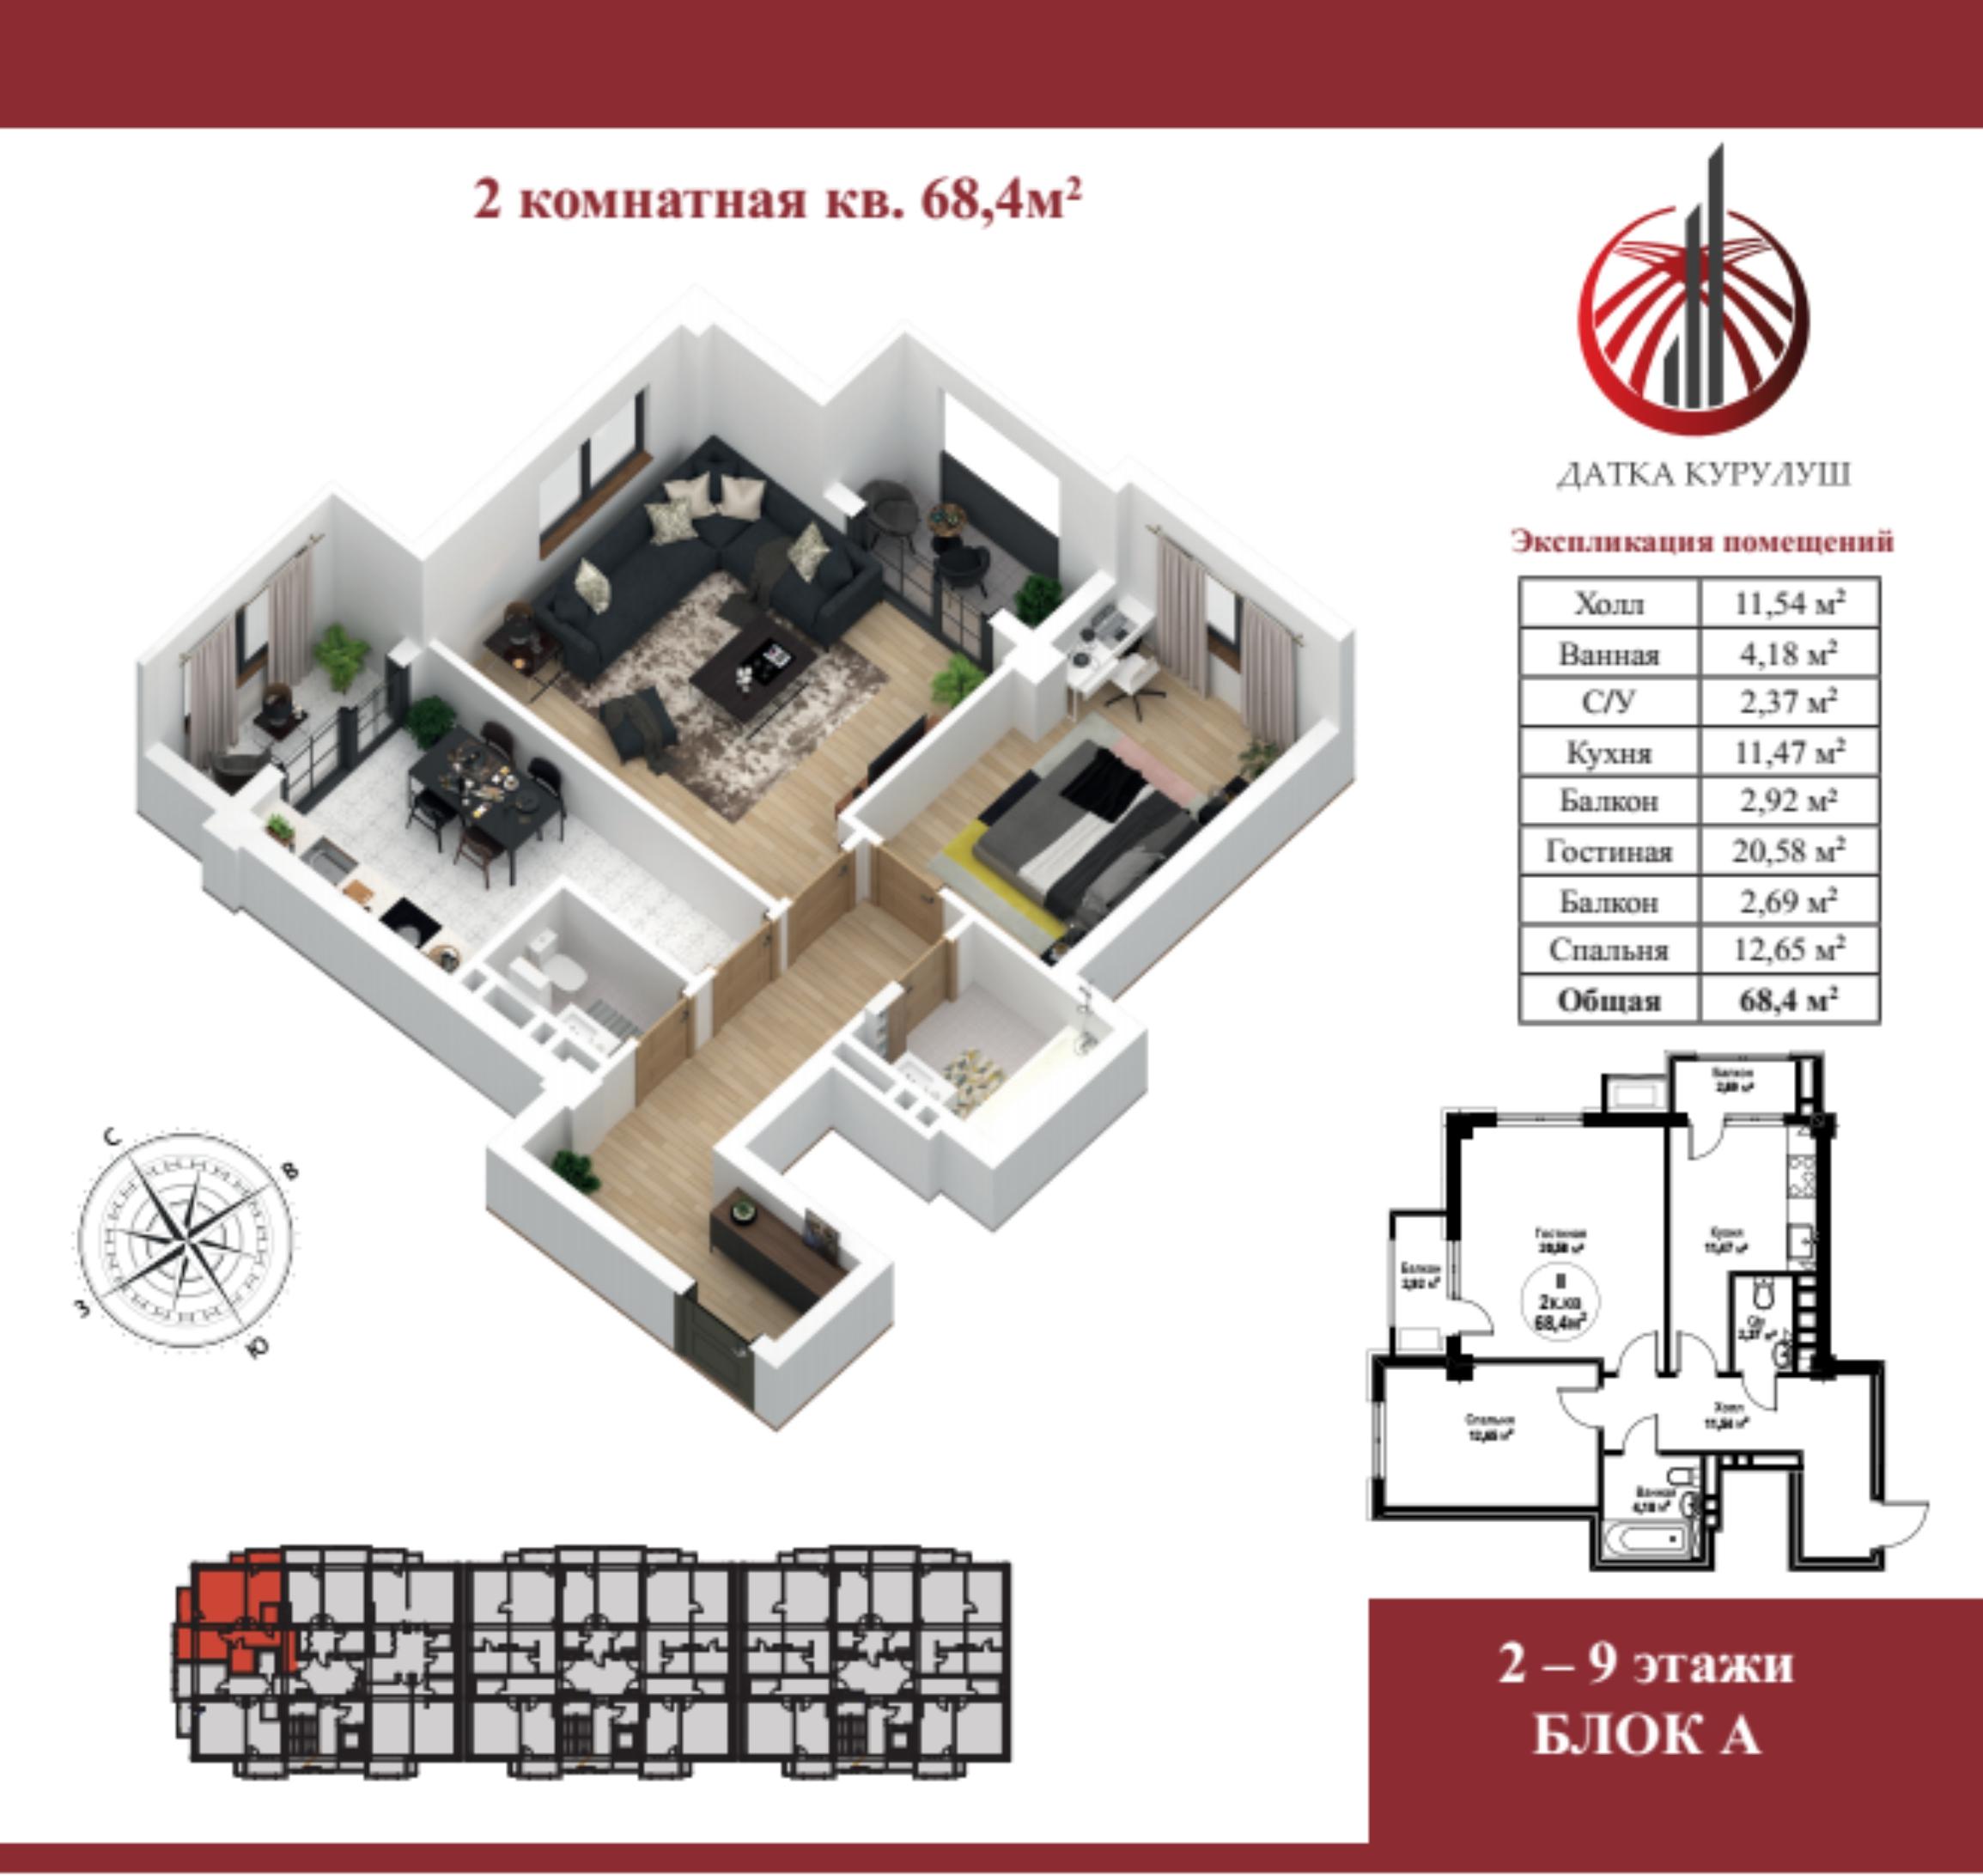 2х комнатная квартира 68,4 кв.м.